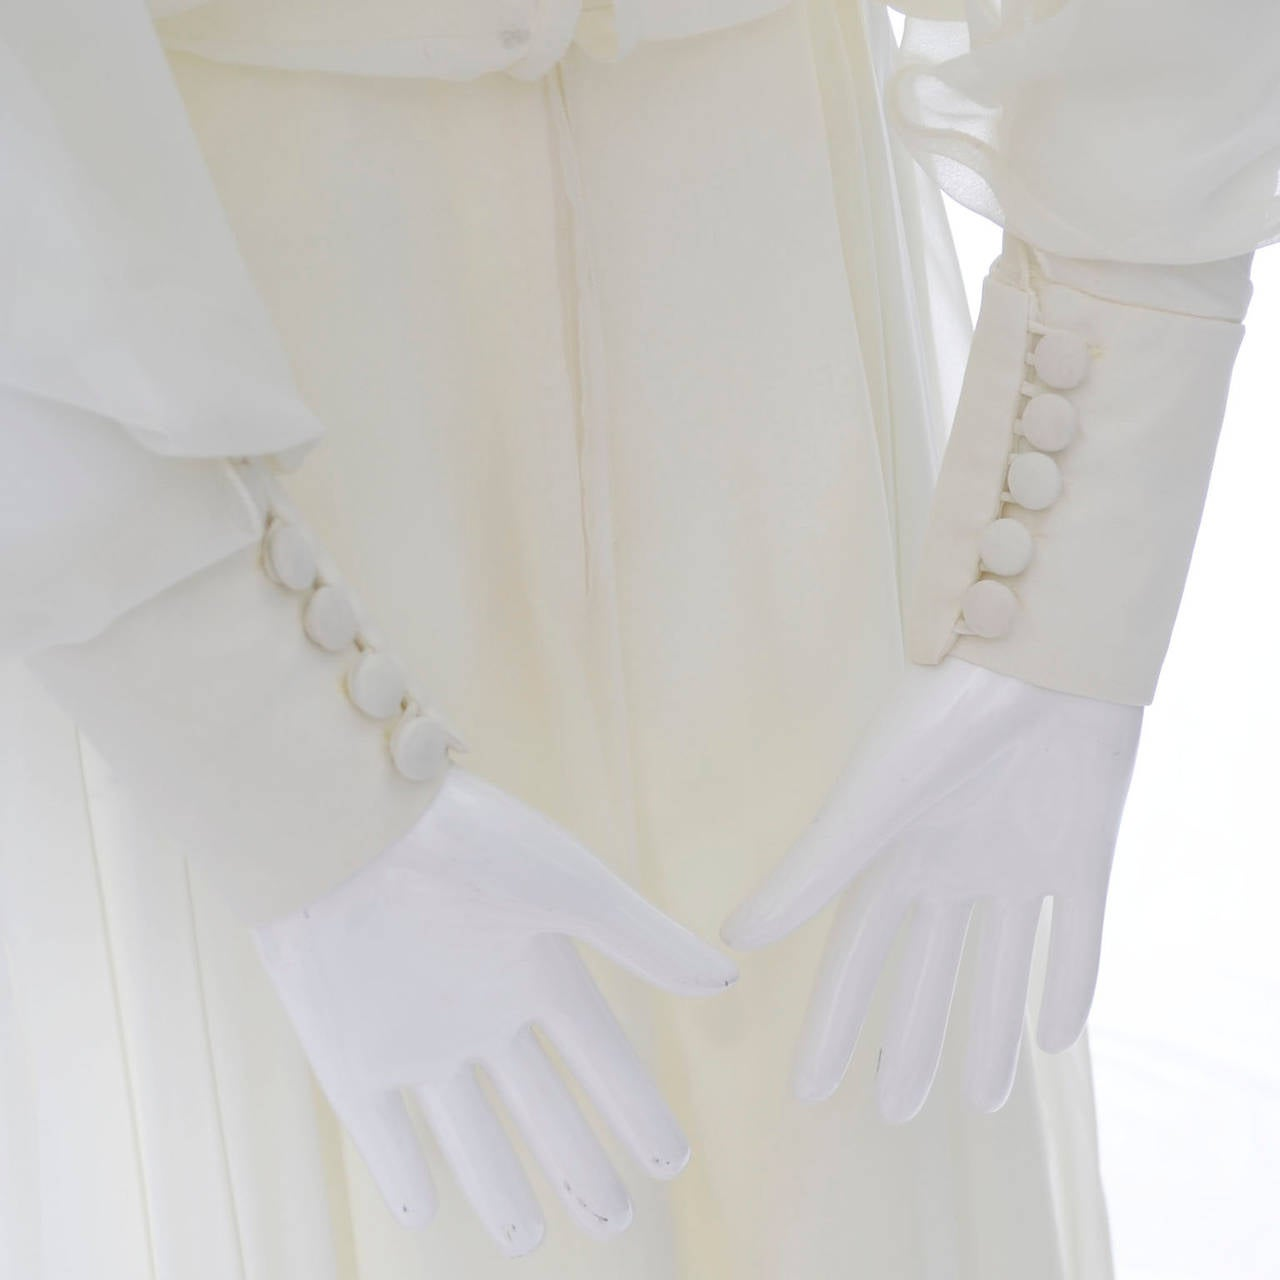 1970s Vintage Jean Varon John Bates Chiffon Designer Dress Batwing Sleeves For Sale 1